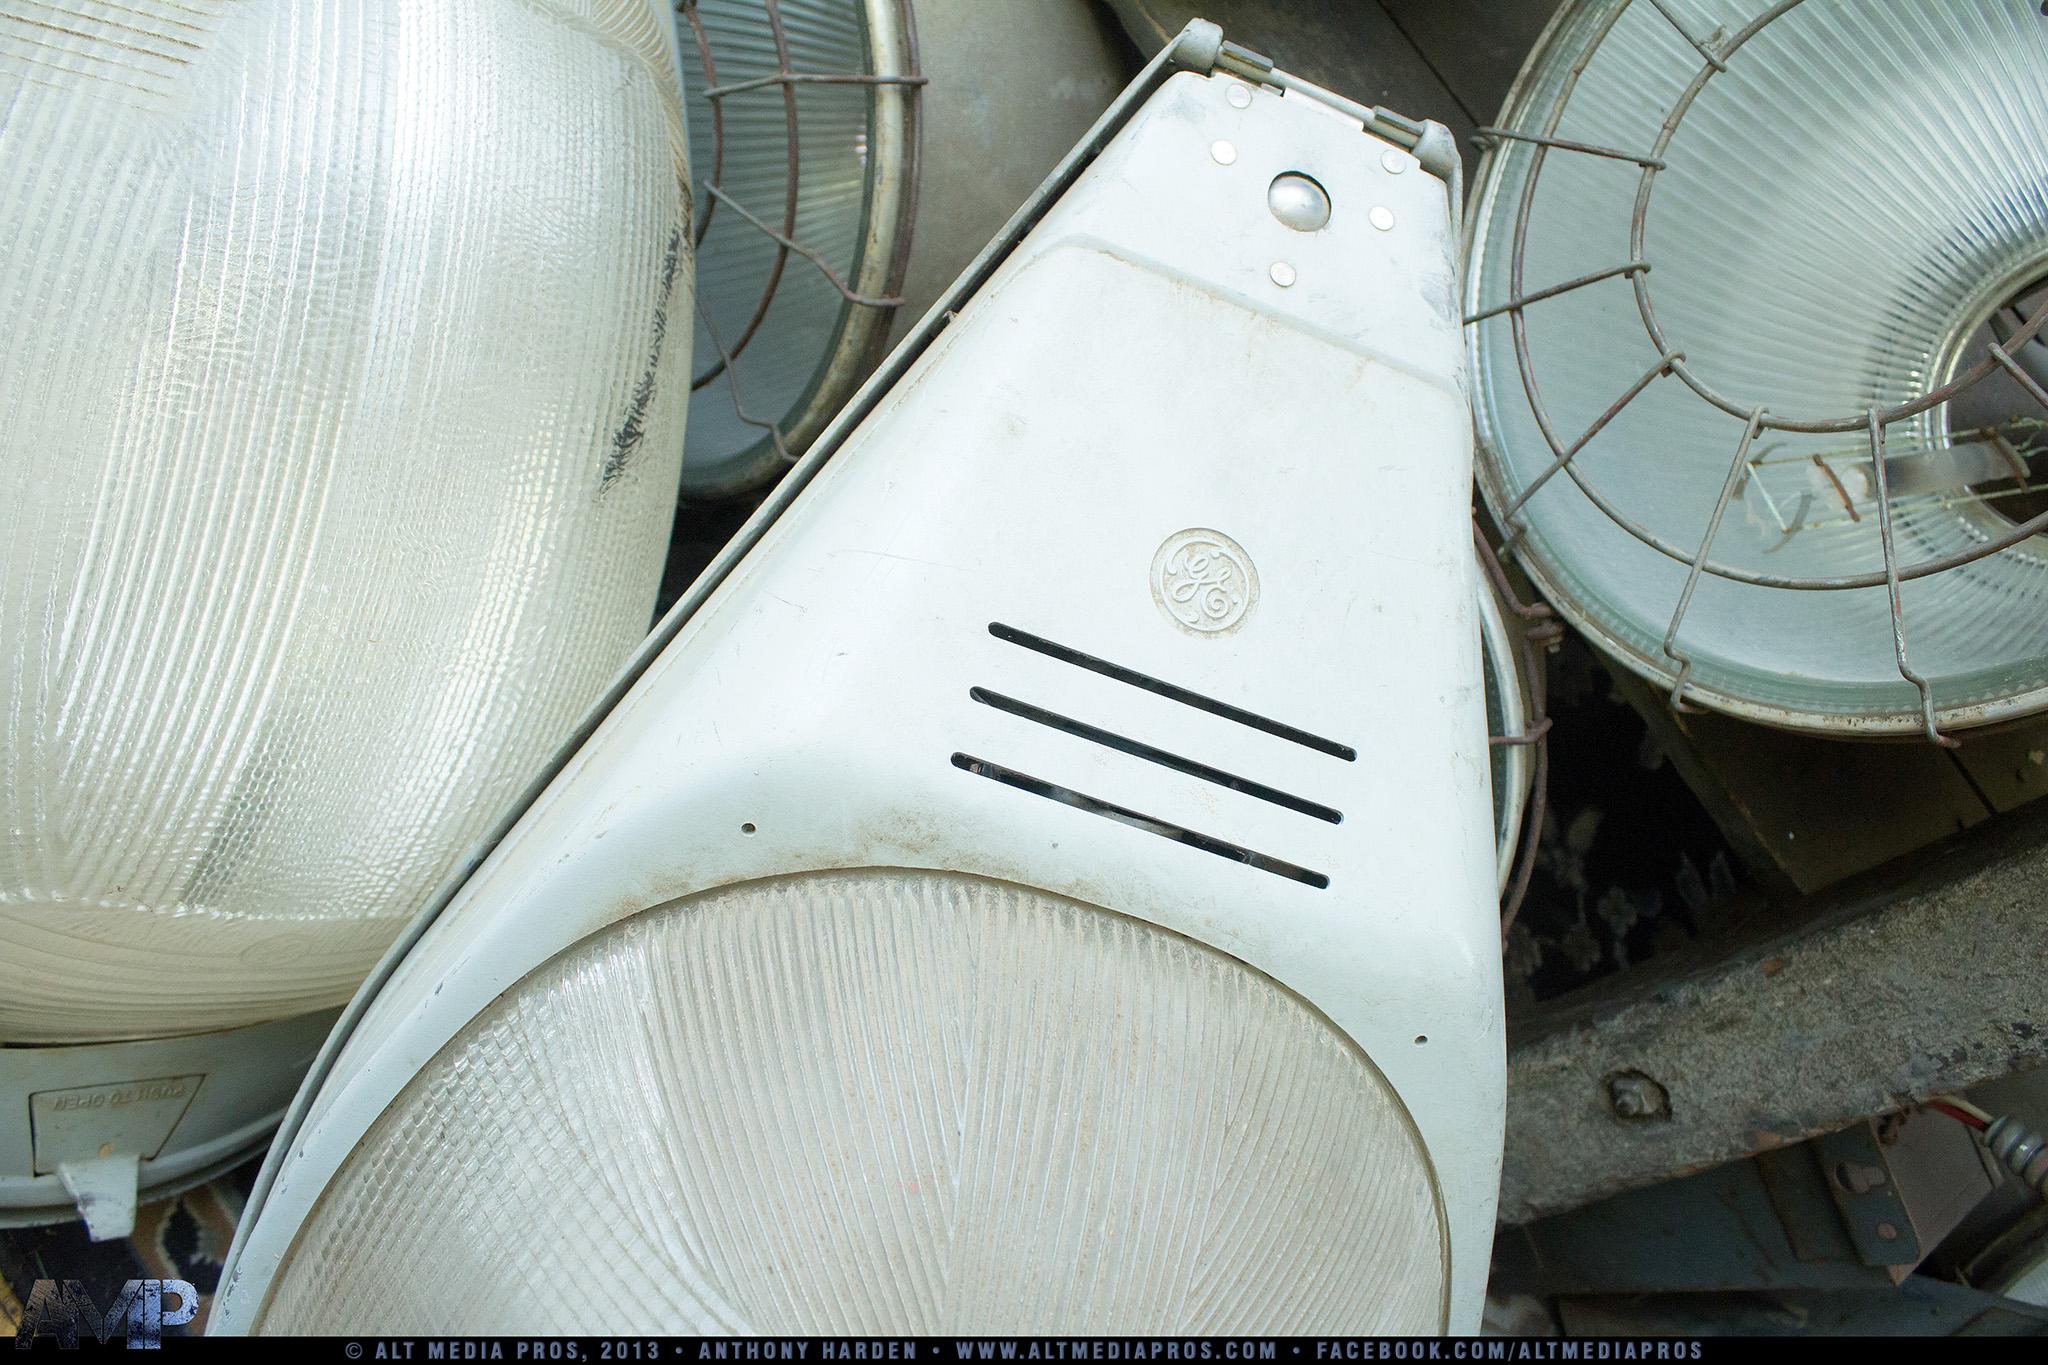 Junk Recyclers_AMP_040113_026.jpg